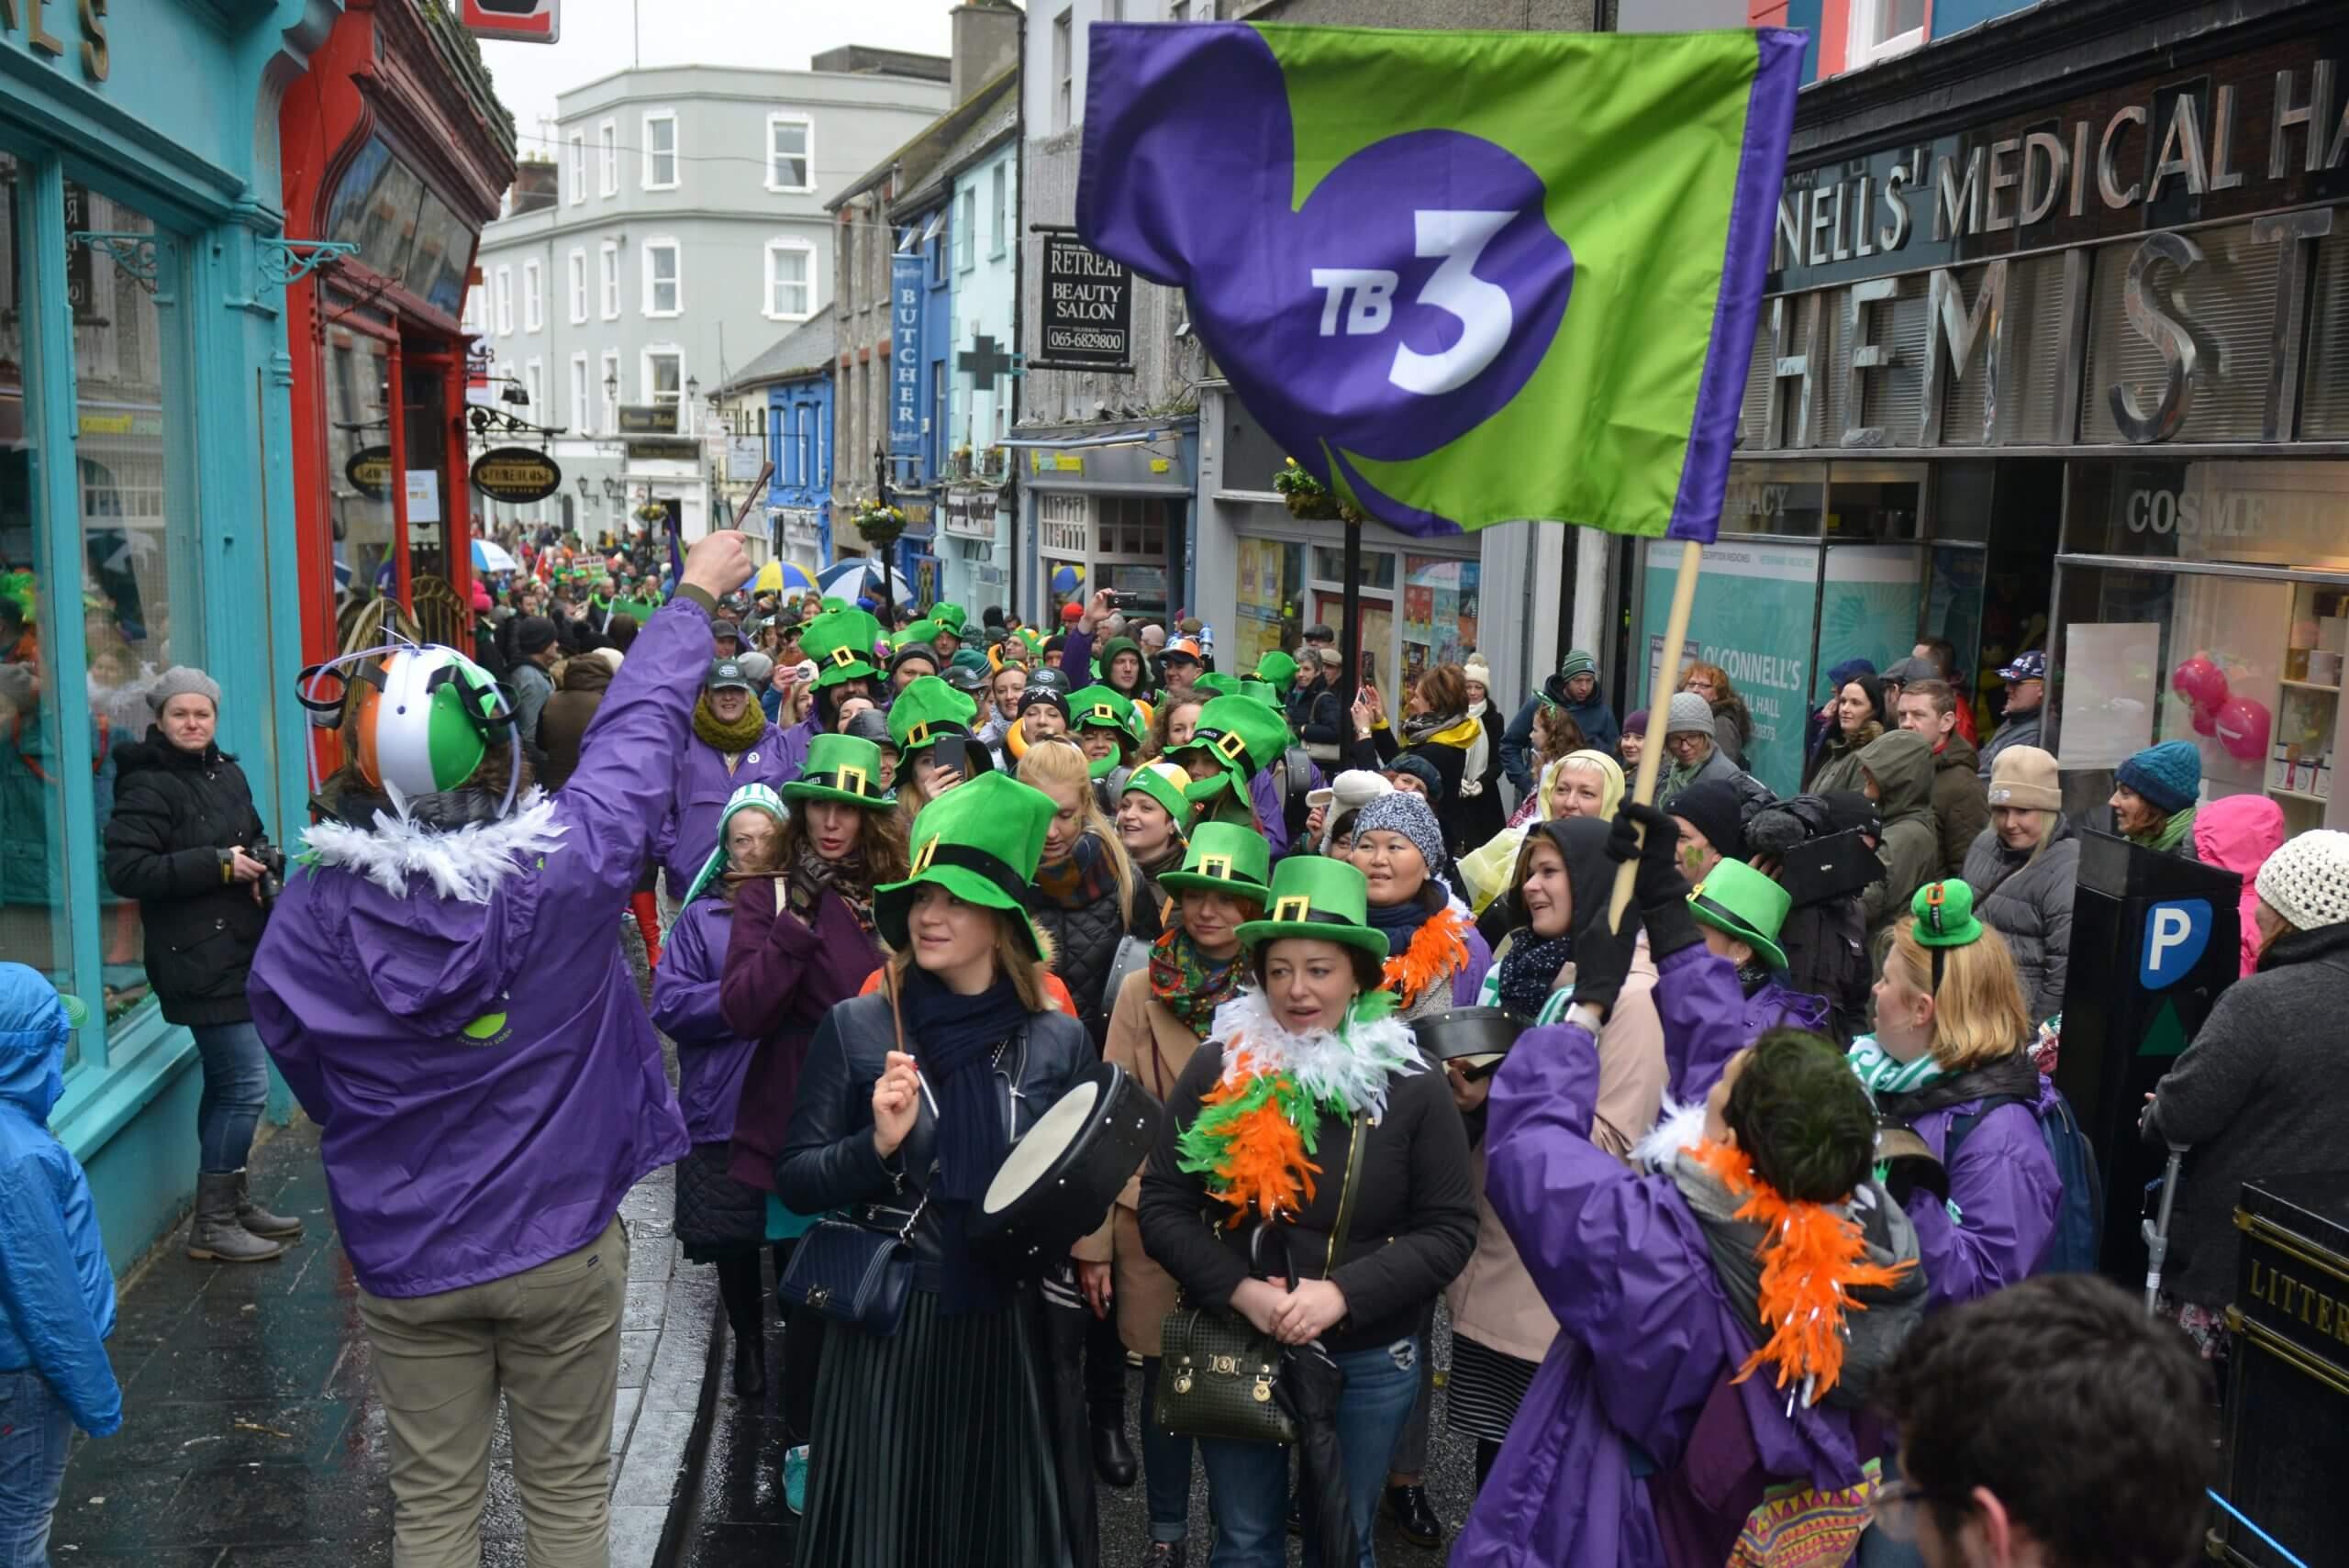 St Patricks Parade in Ireland